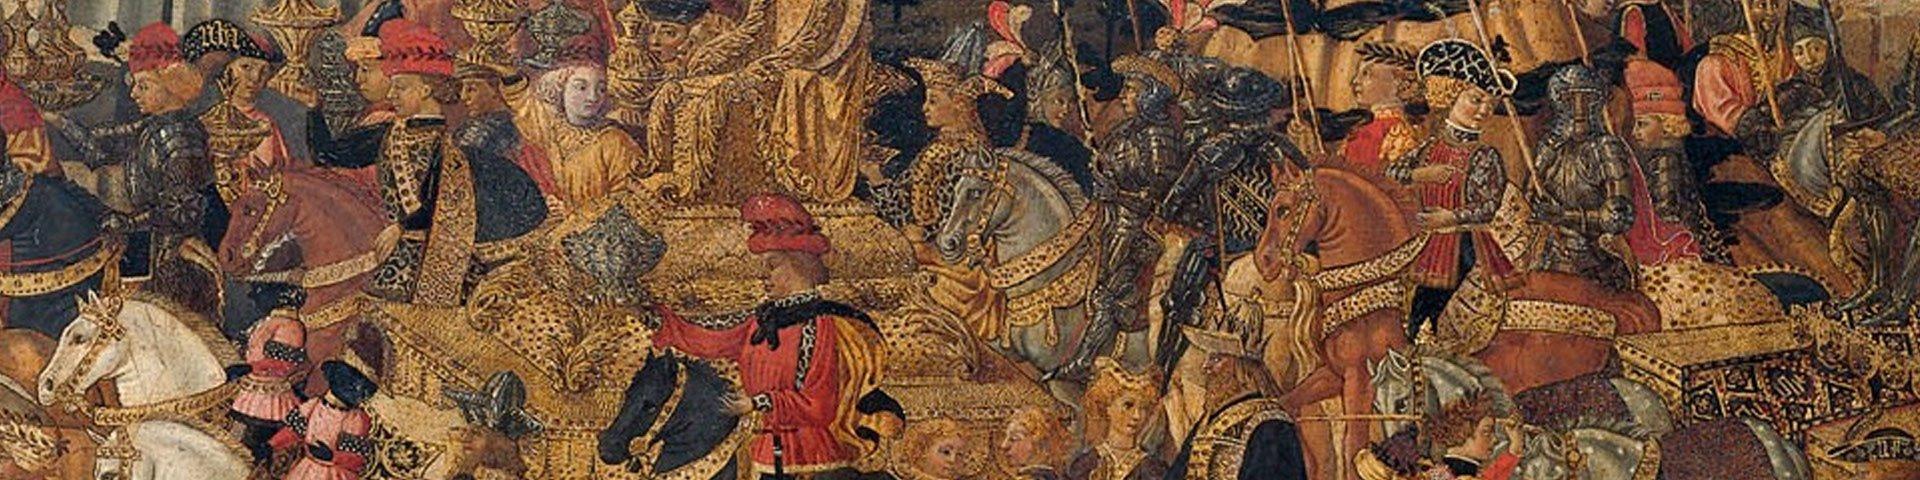 The Battle of Pydna (168 B.C.): Rome defeats Macedonia